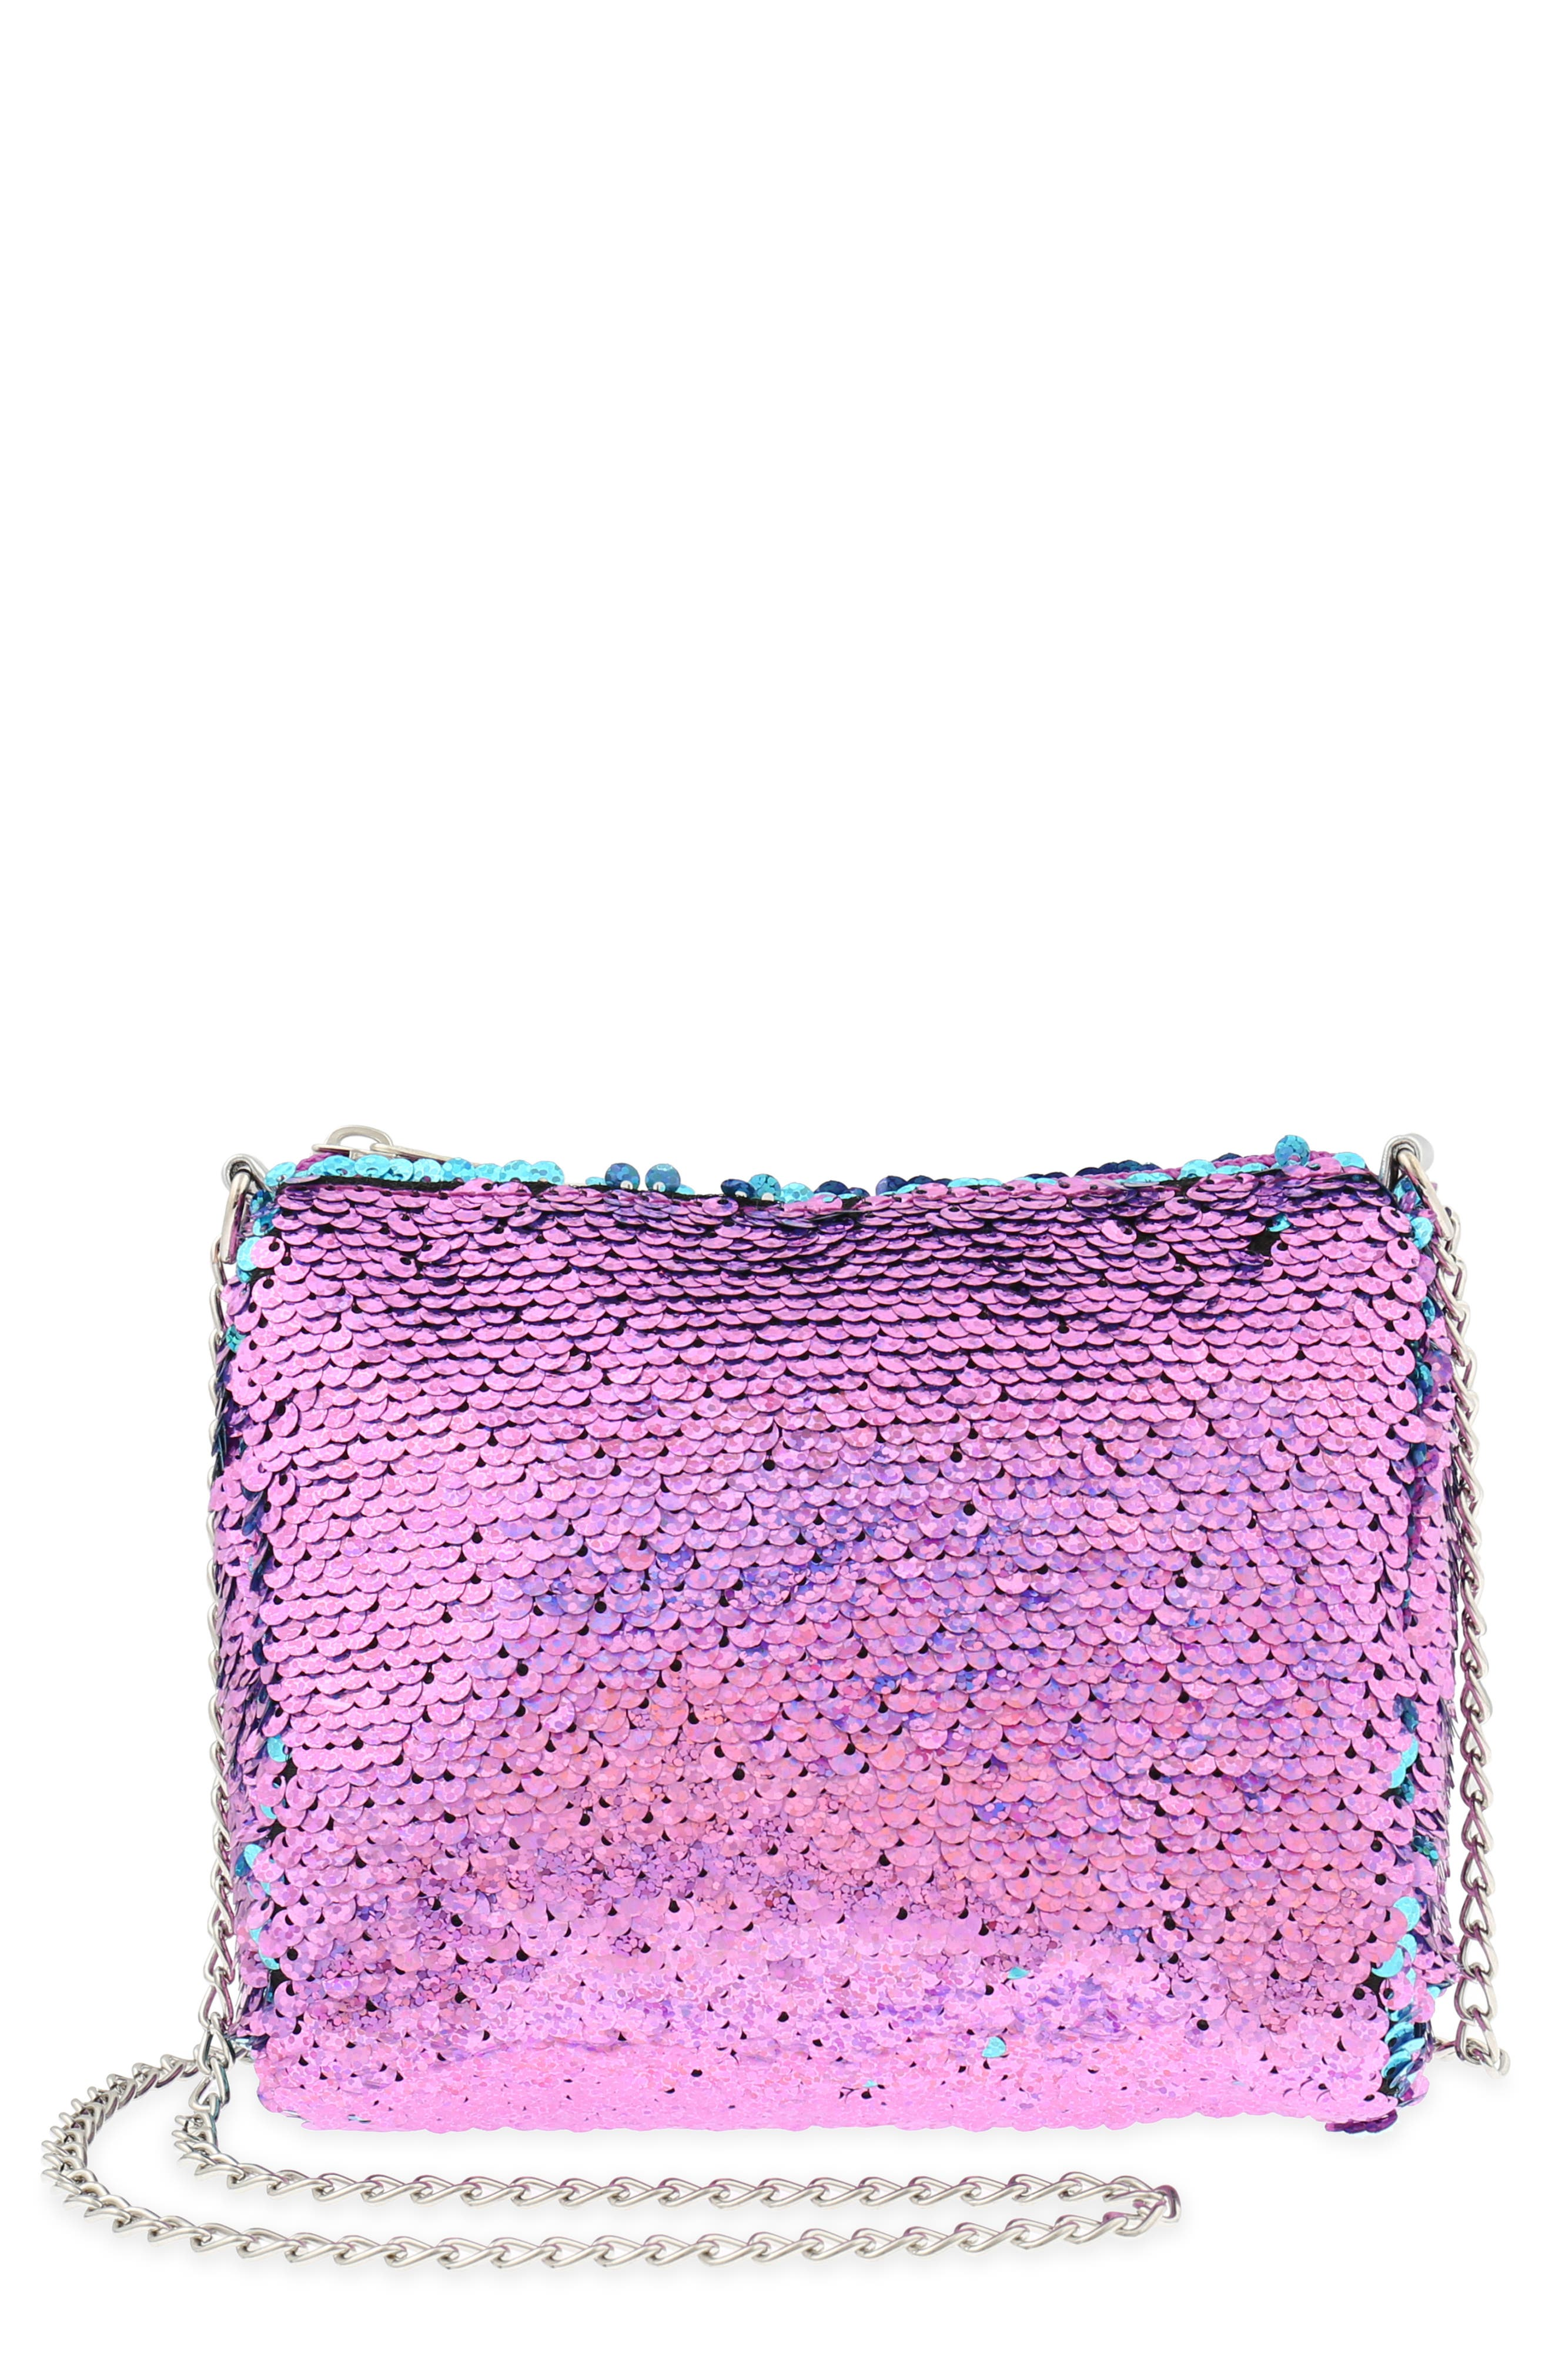 Flip Sequin Shoulder Bag,                             Main thumbnail 1, color,                             442